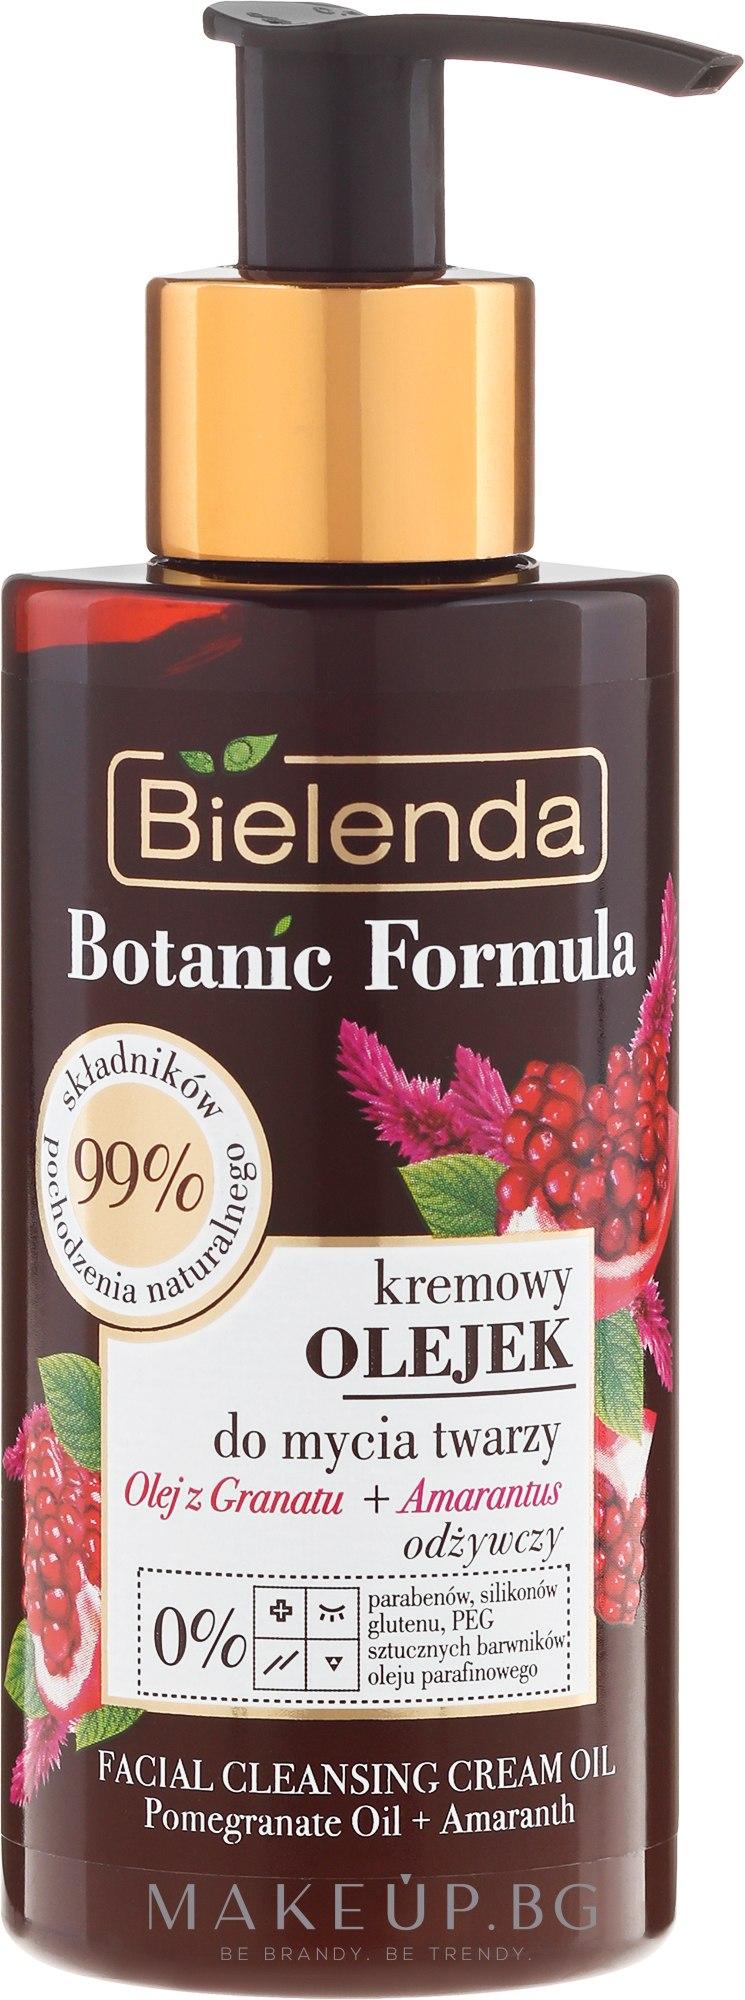 Почистващо кремообразно масло за лице - Bielenda Botanic Formula Pomegranate Oil + Amaranth Facial Cleansing Cream Oil — снимка 140 ml